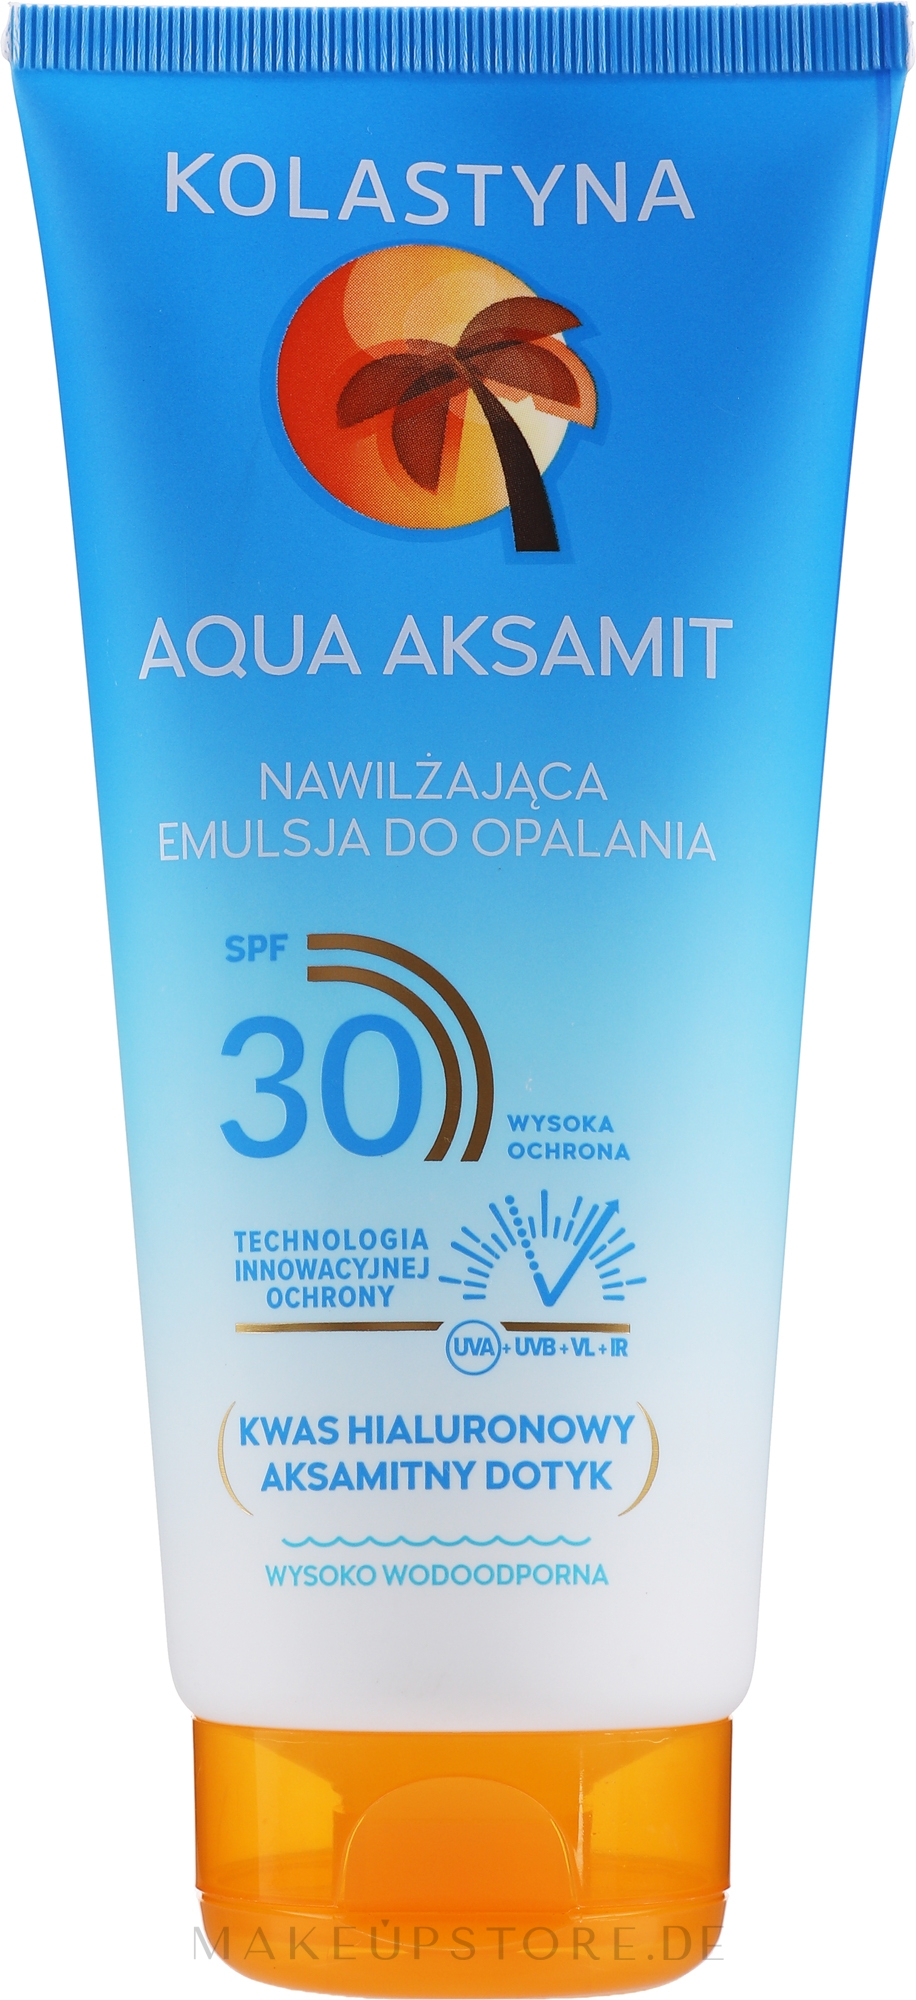 Feuchtigkeitsspendende Sonnenschutzemulsion für den Körper SPF 30 - Kolastyna Aqua Aksamit Suncare Emulsion SPF 30 — Bild 200 ml